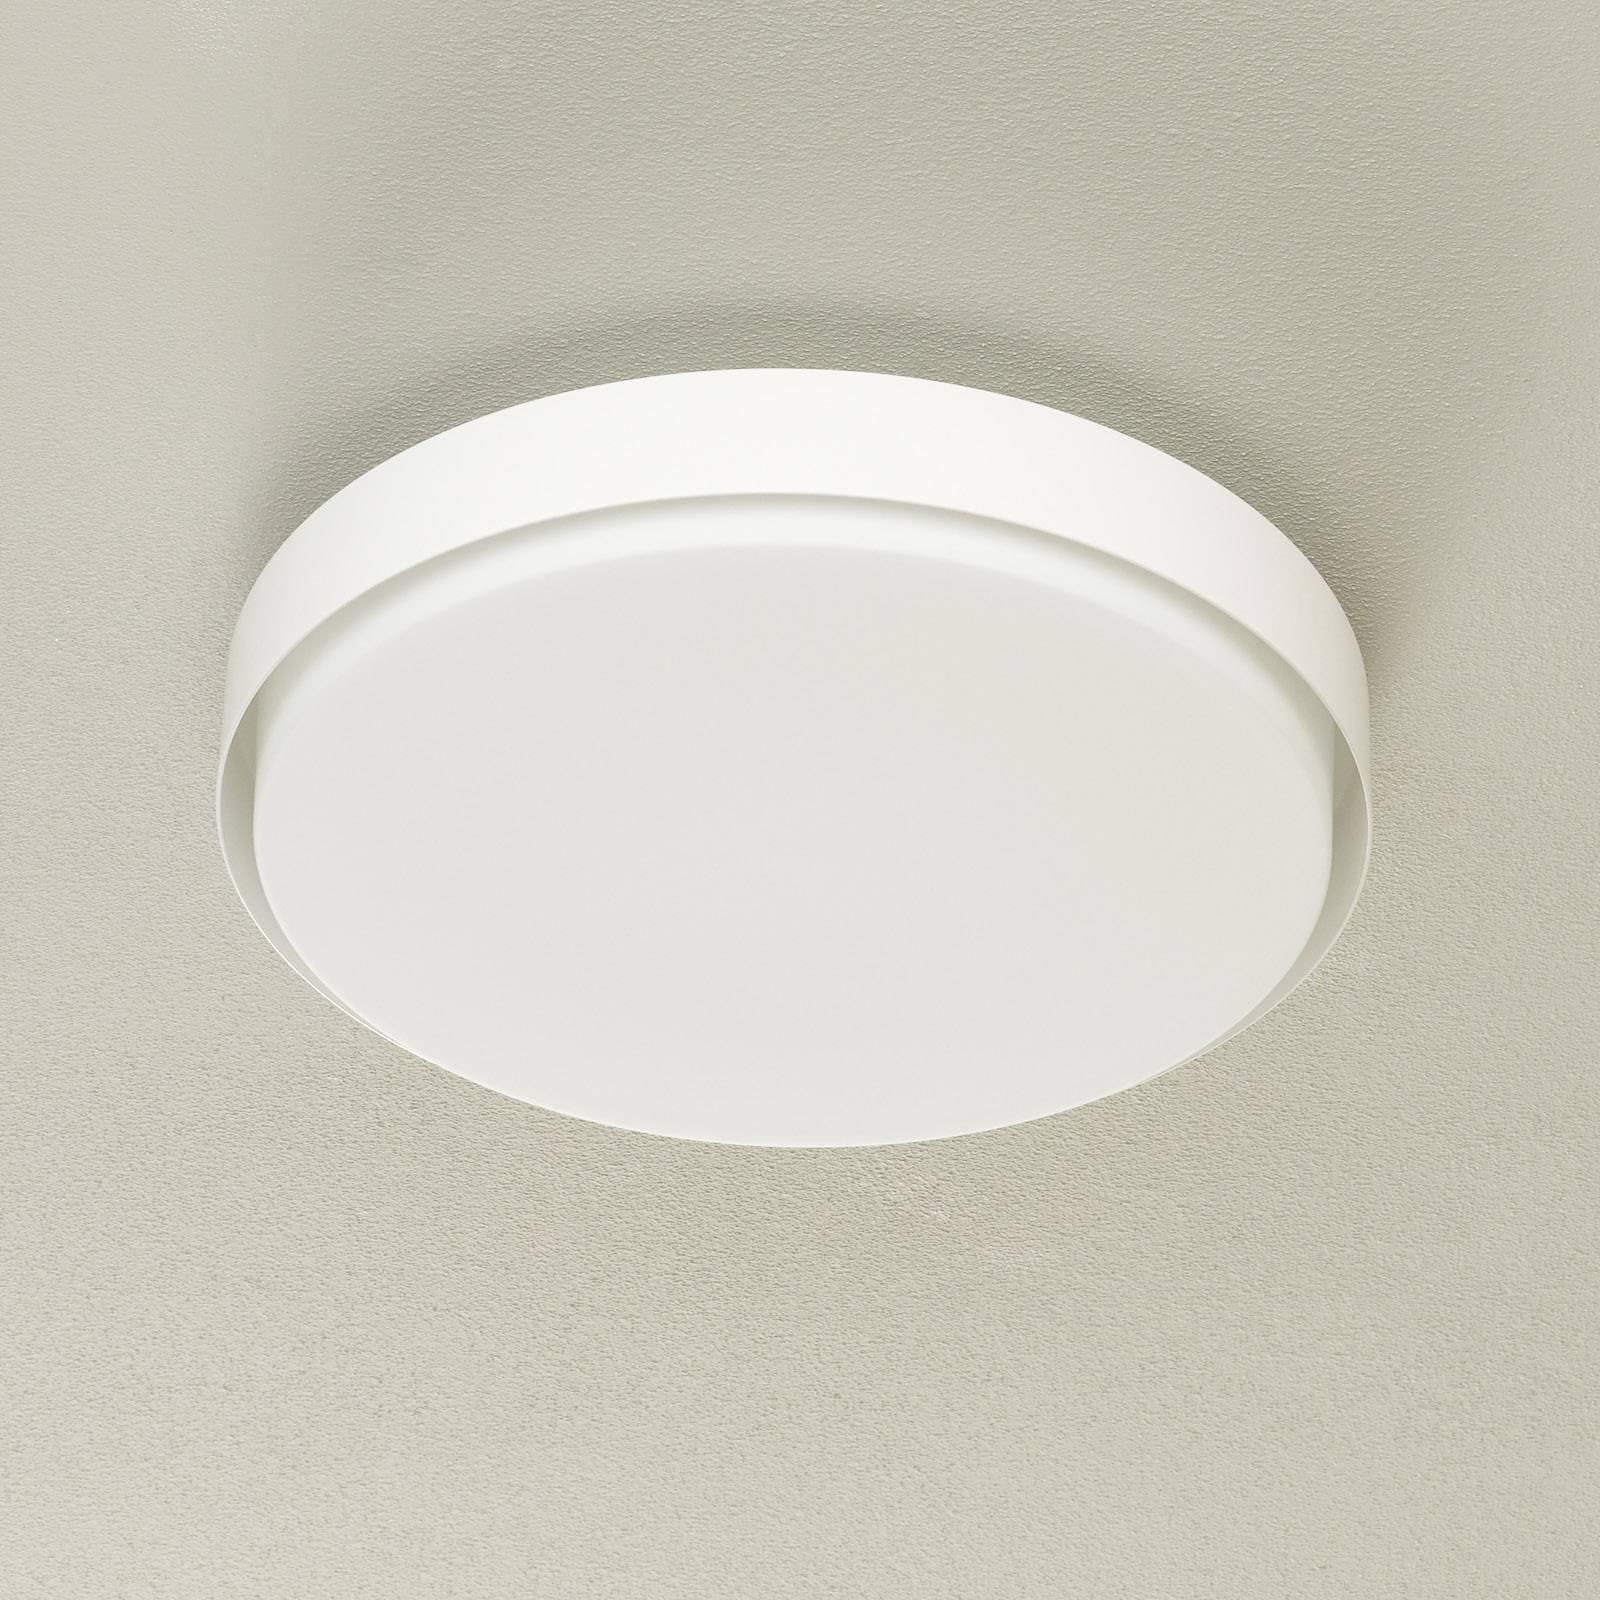 BEGA 34279 LED-kattovalaisin, valkoinen, Ø 42 cm